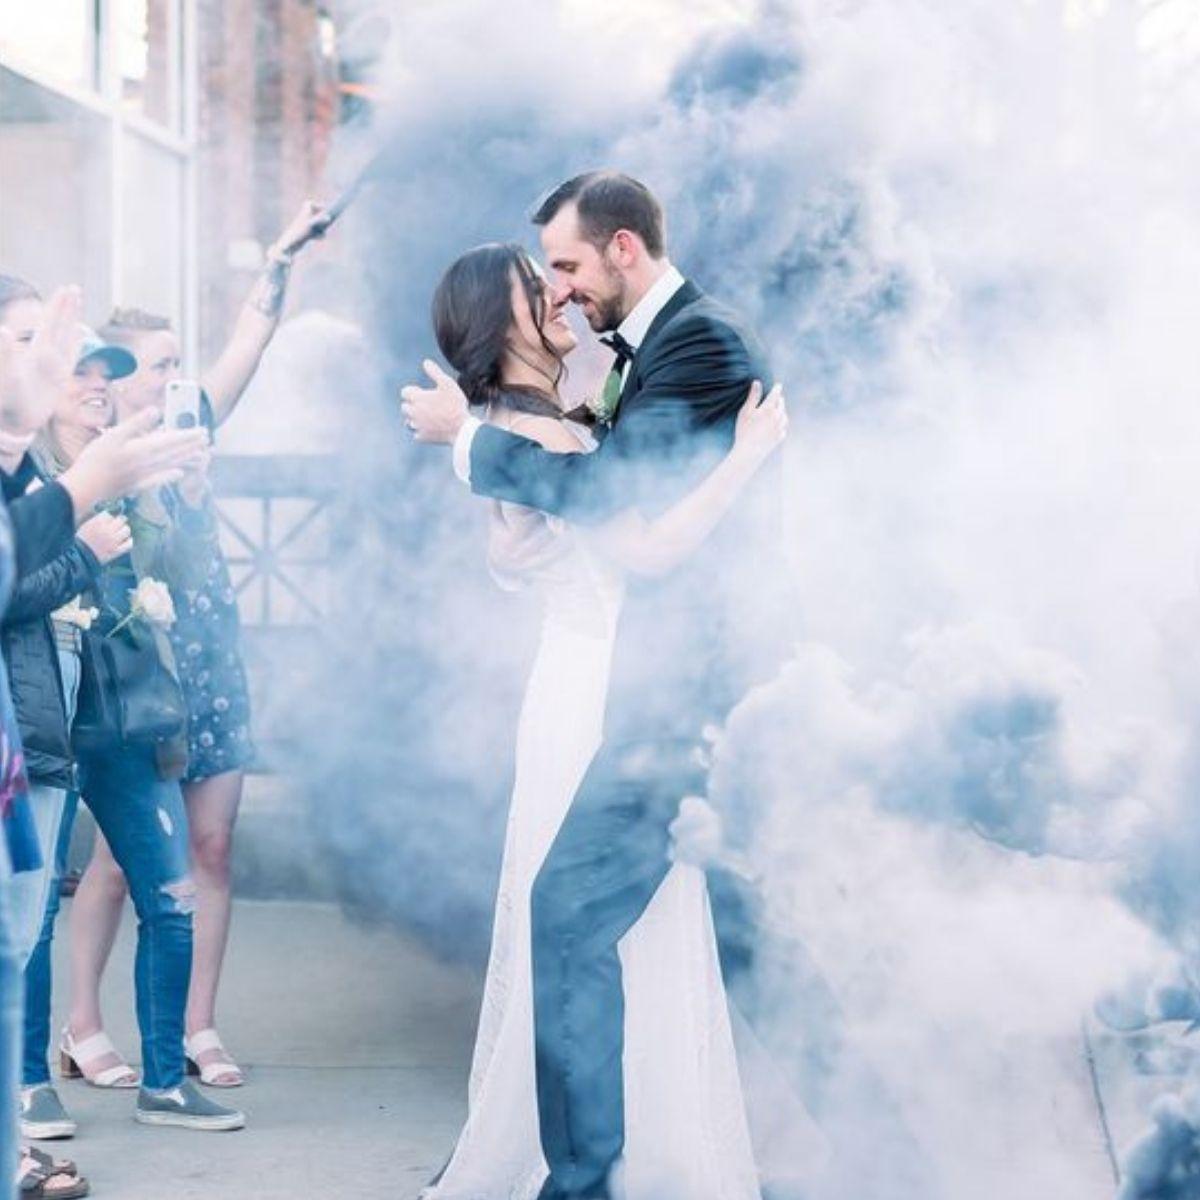 Creative and Fun Wedding Exit Send-off: smoke bombs